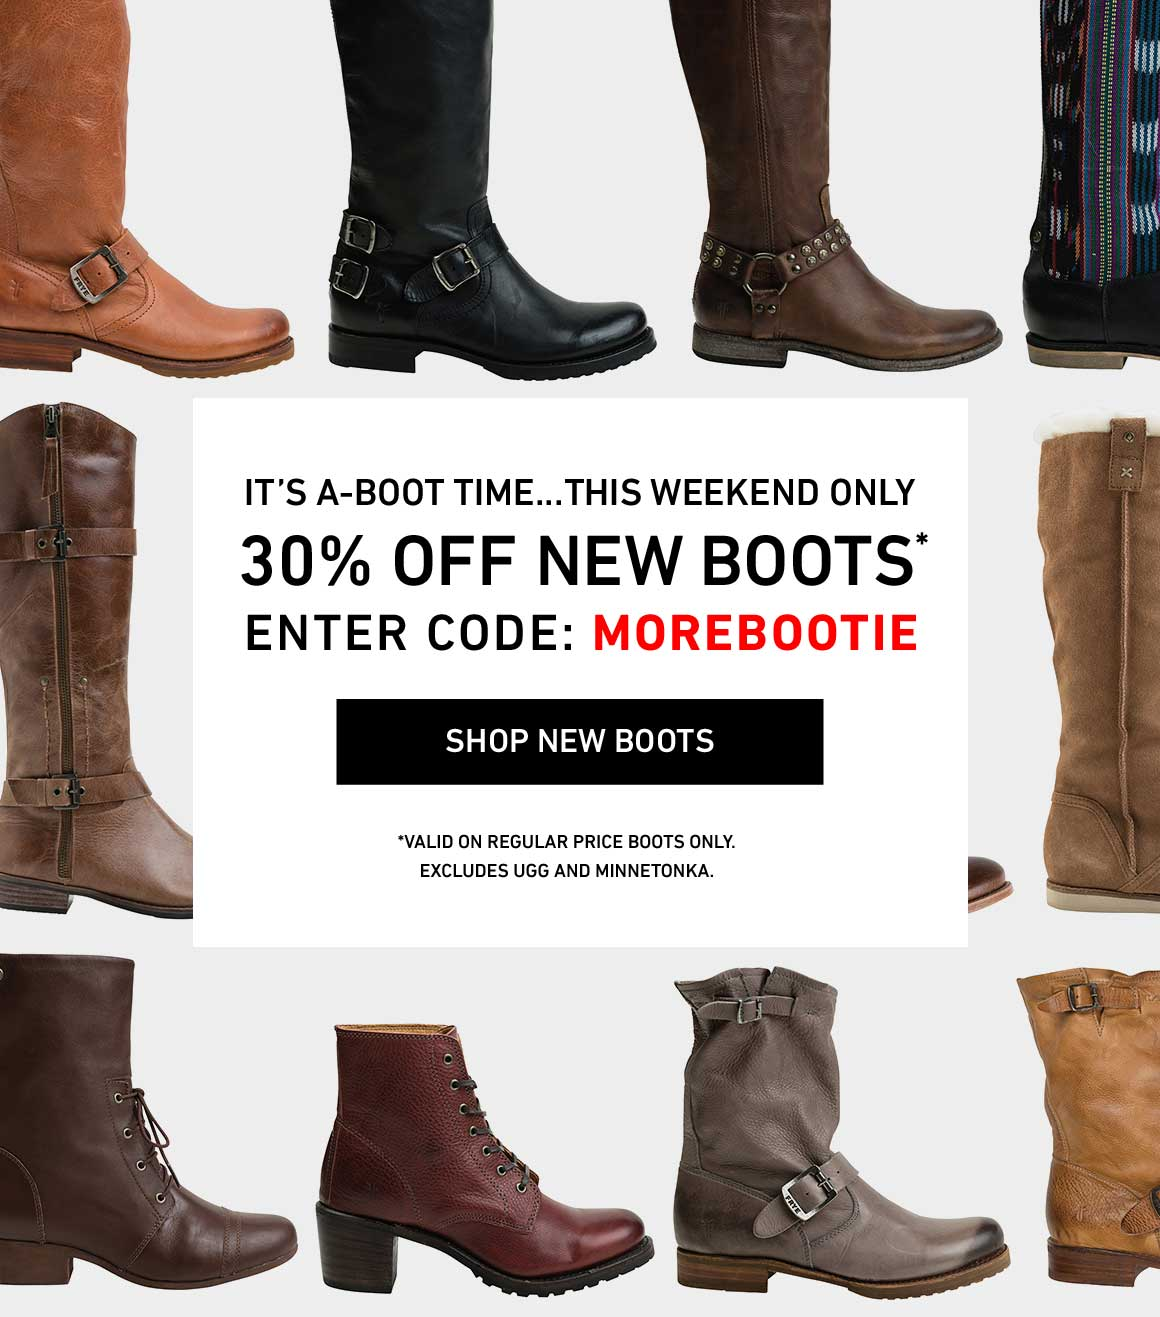 30% Off All New Women's Boots! Enter Code: MOREBOOTIE